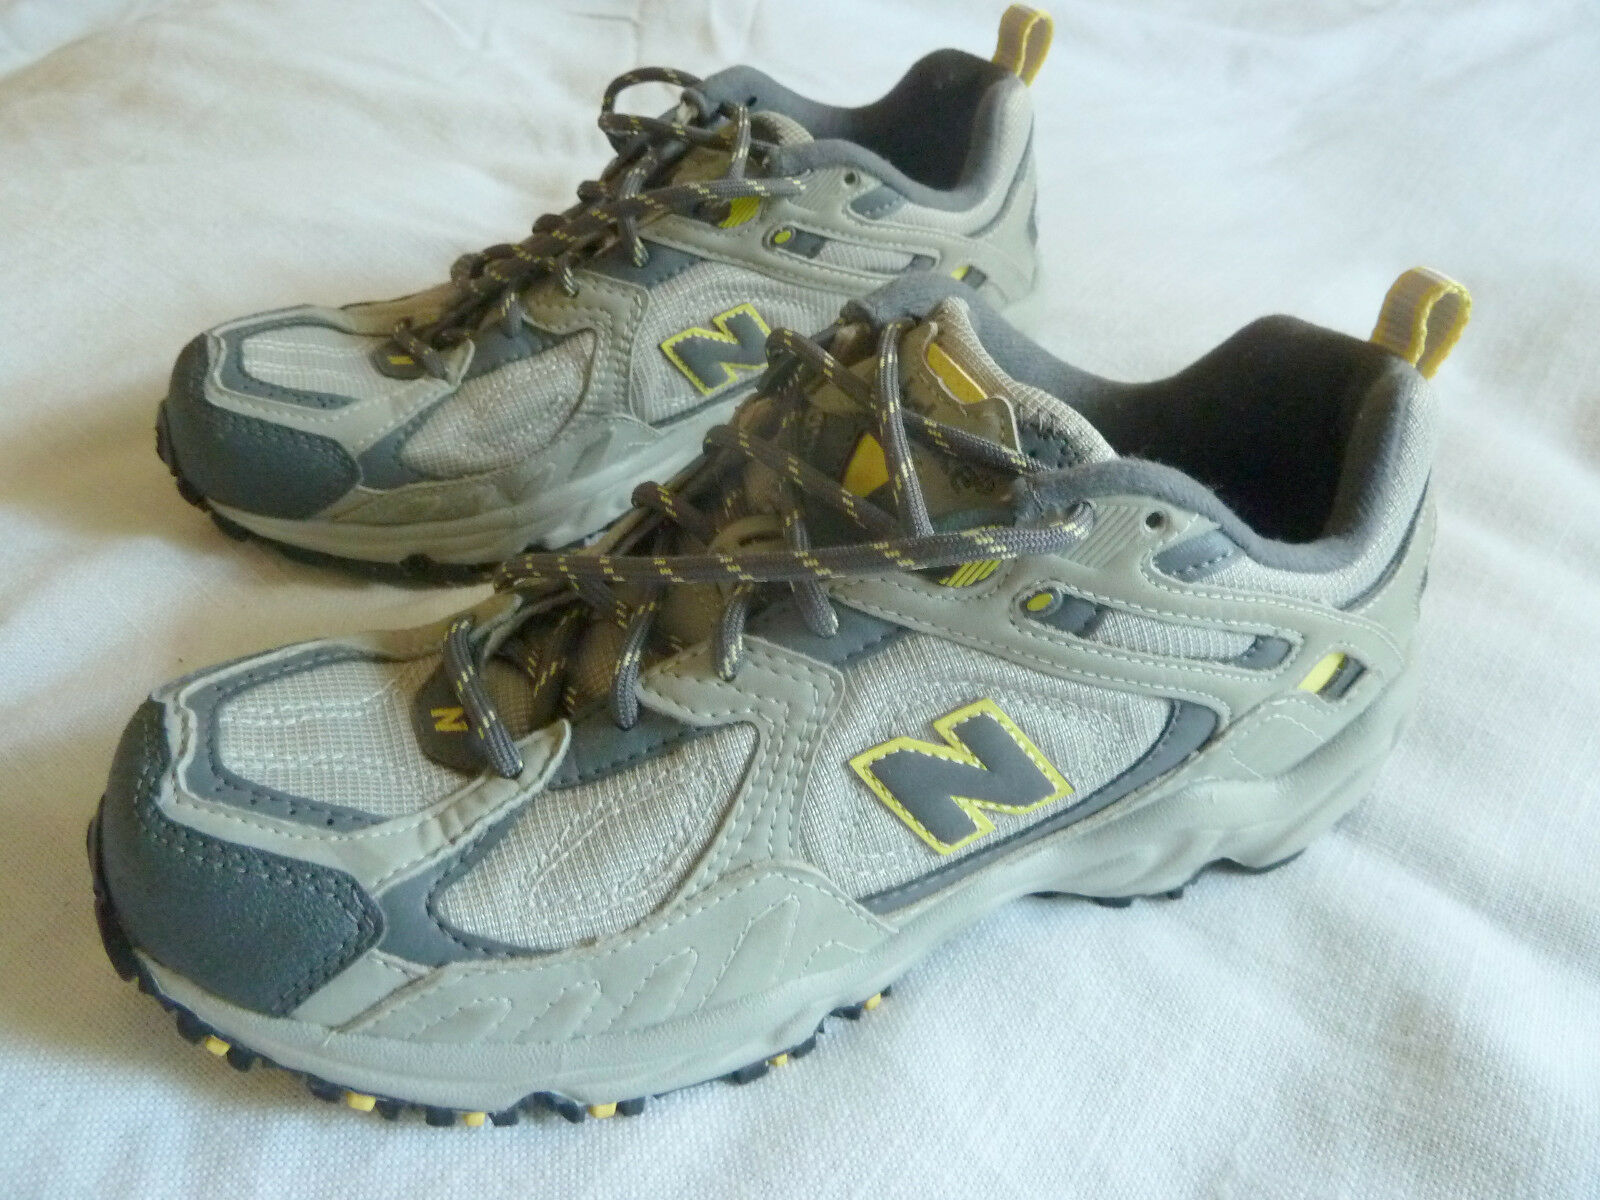 LN New Balance 471 Womens 8.5B TRAIL Running Grey/Yellow Sneakers Shoes USA